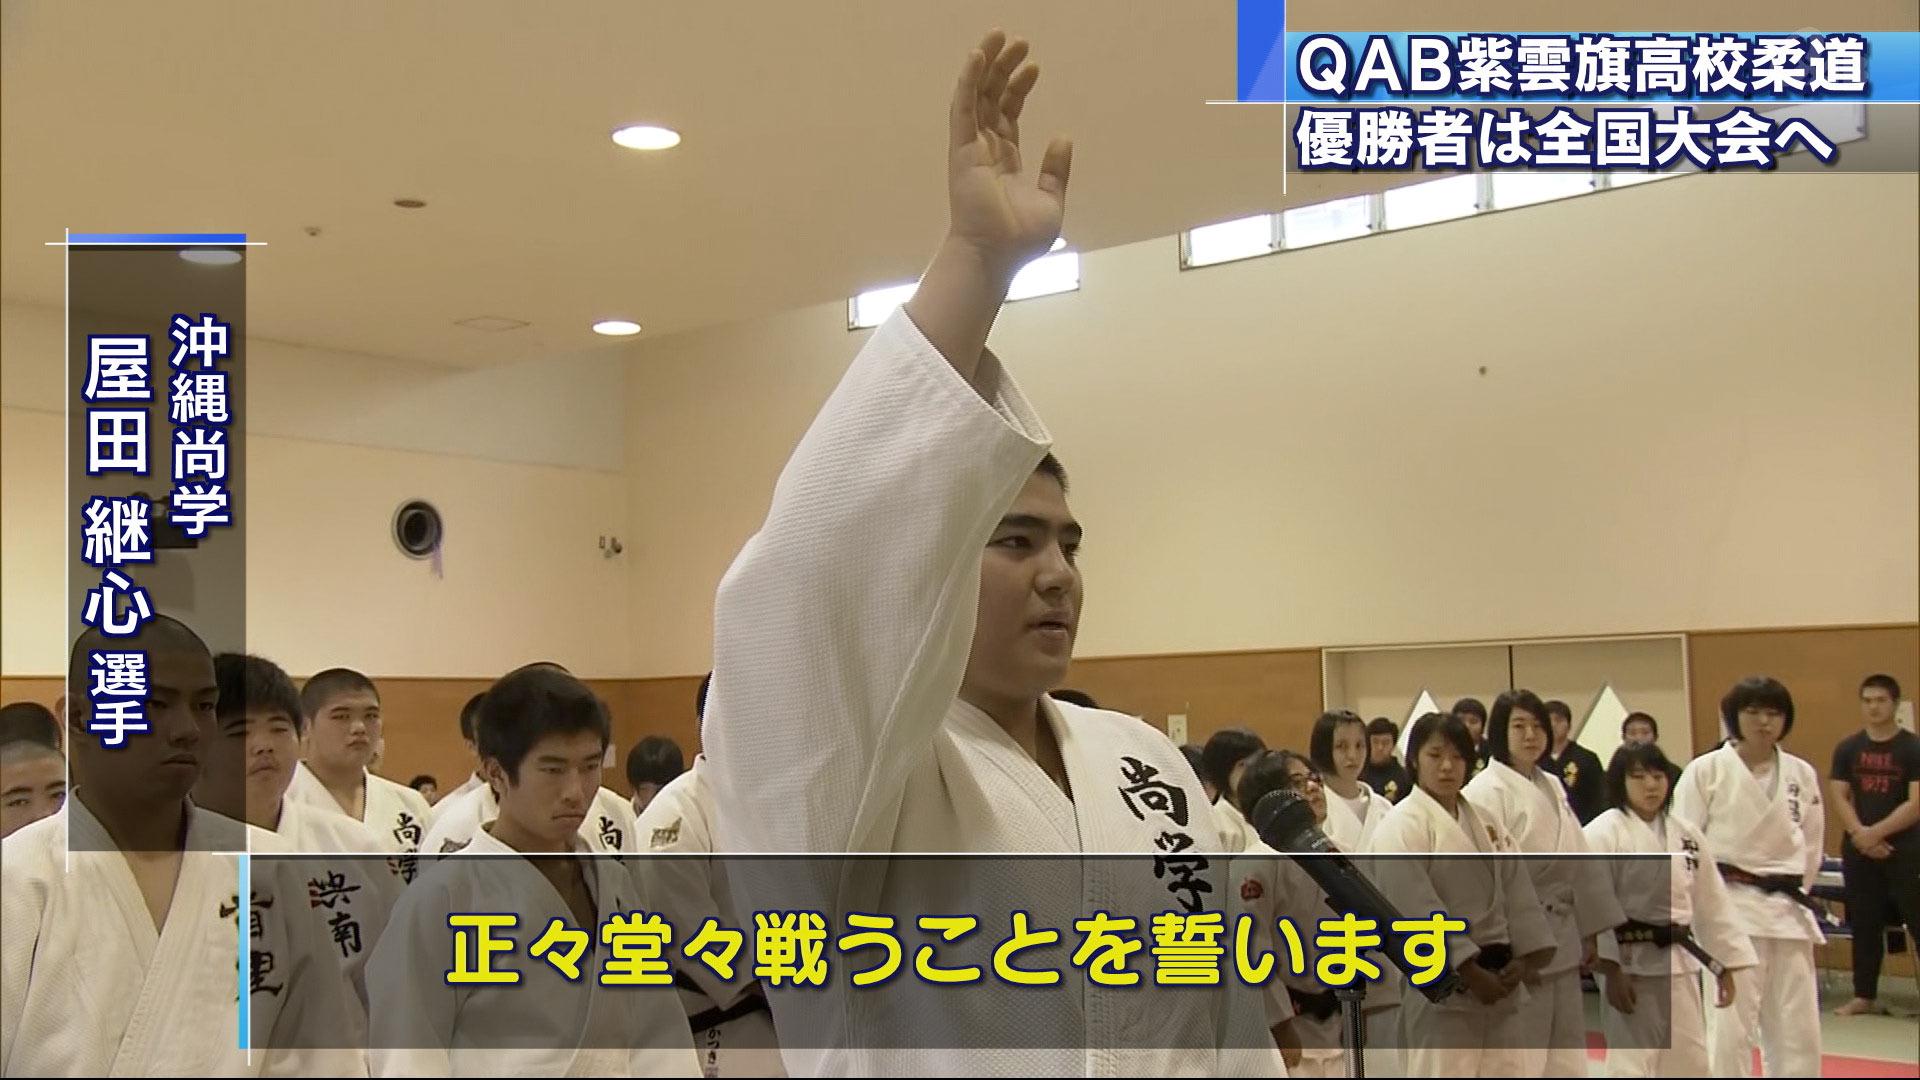 QAB紫雲旗争奪高校柔道で熱戦続く